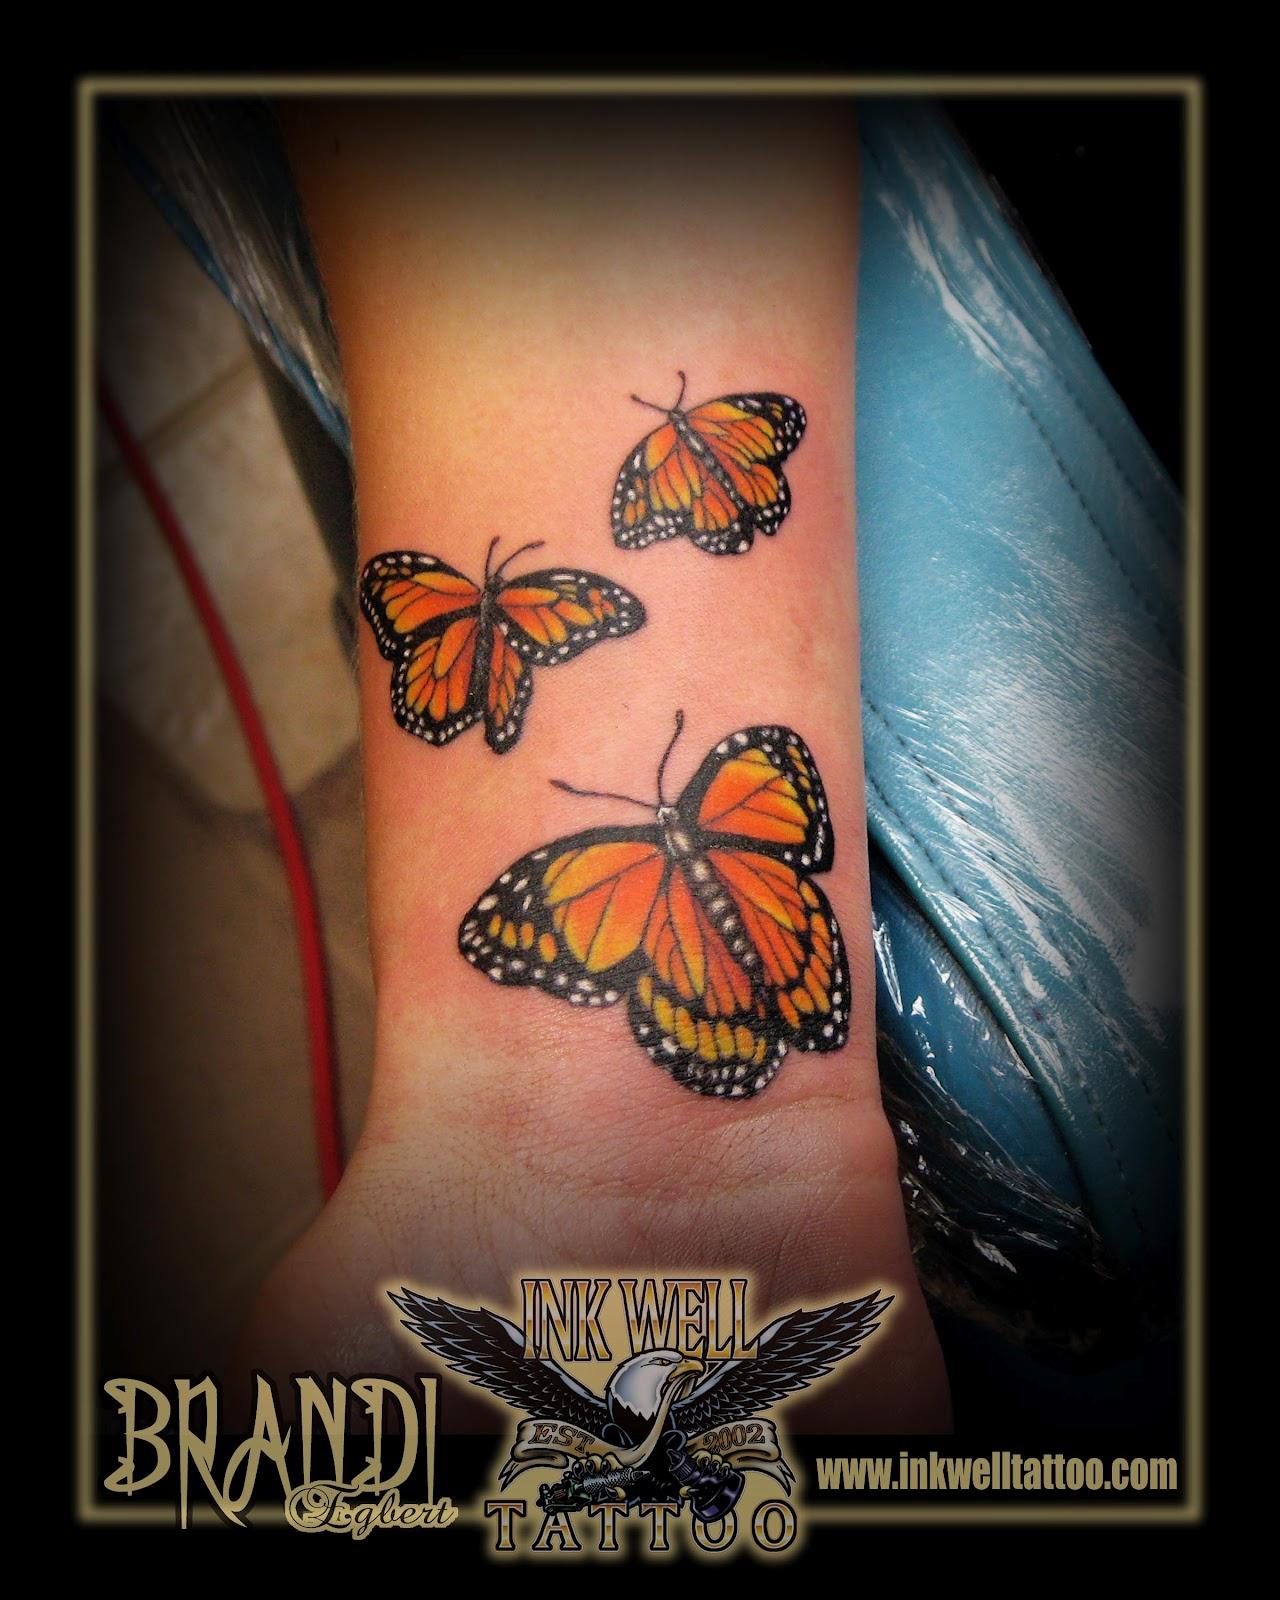 Brandi Egbert (Ink Well Tattoo): Butterflies!